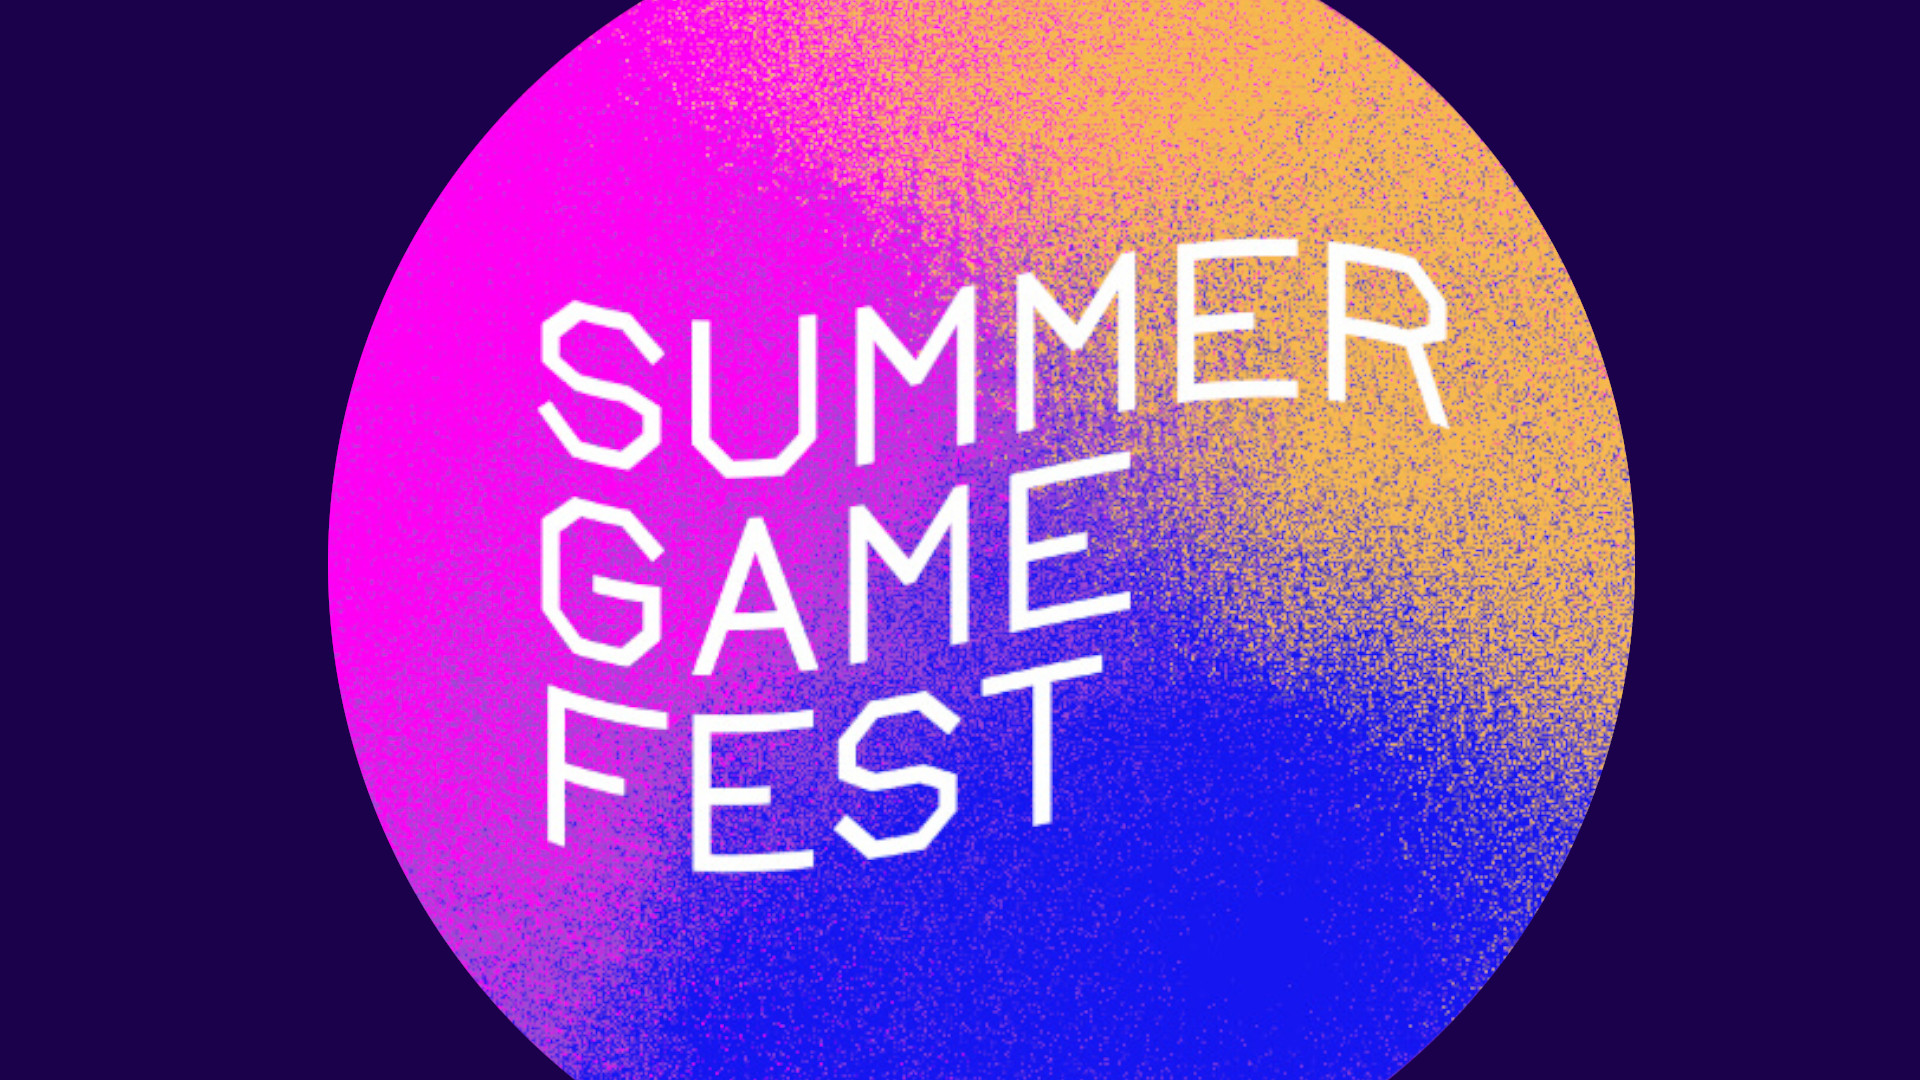 Summer Game Fest's Kick Off Live has Weezer, but no word on Elden Ring